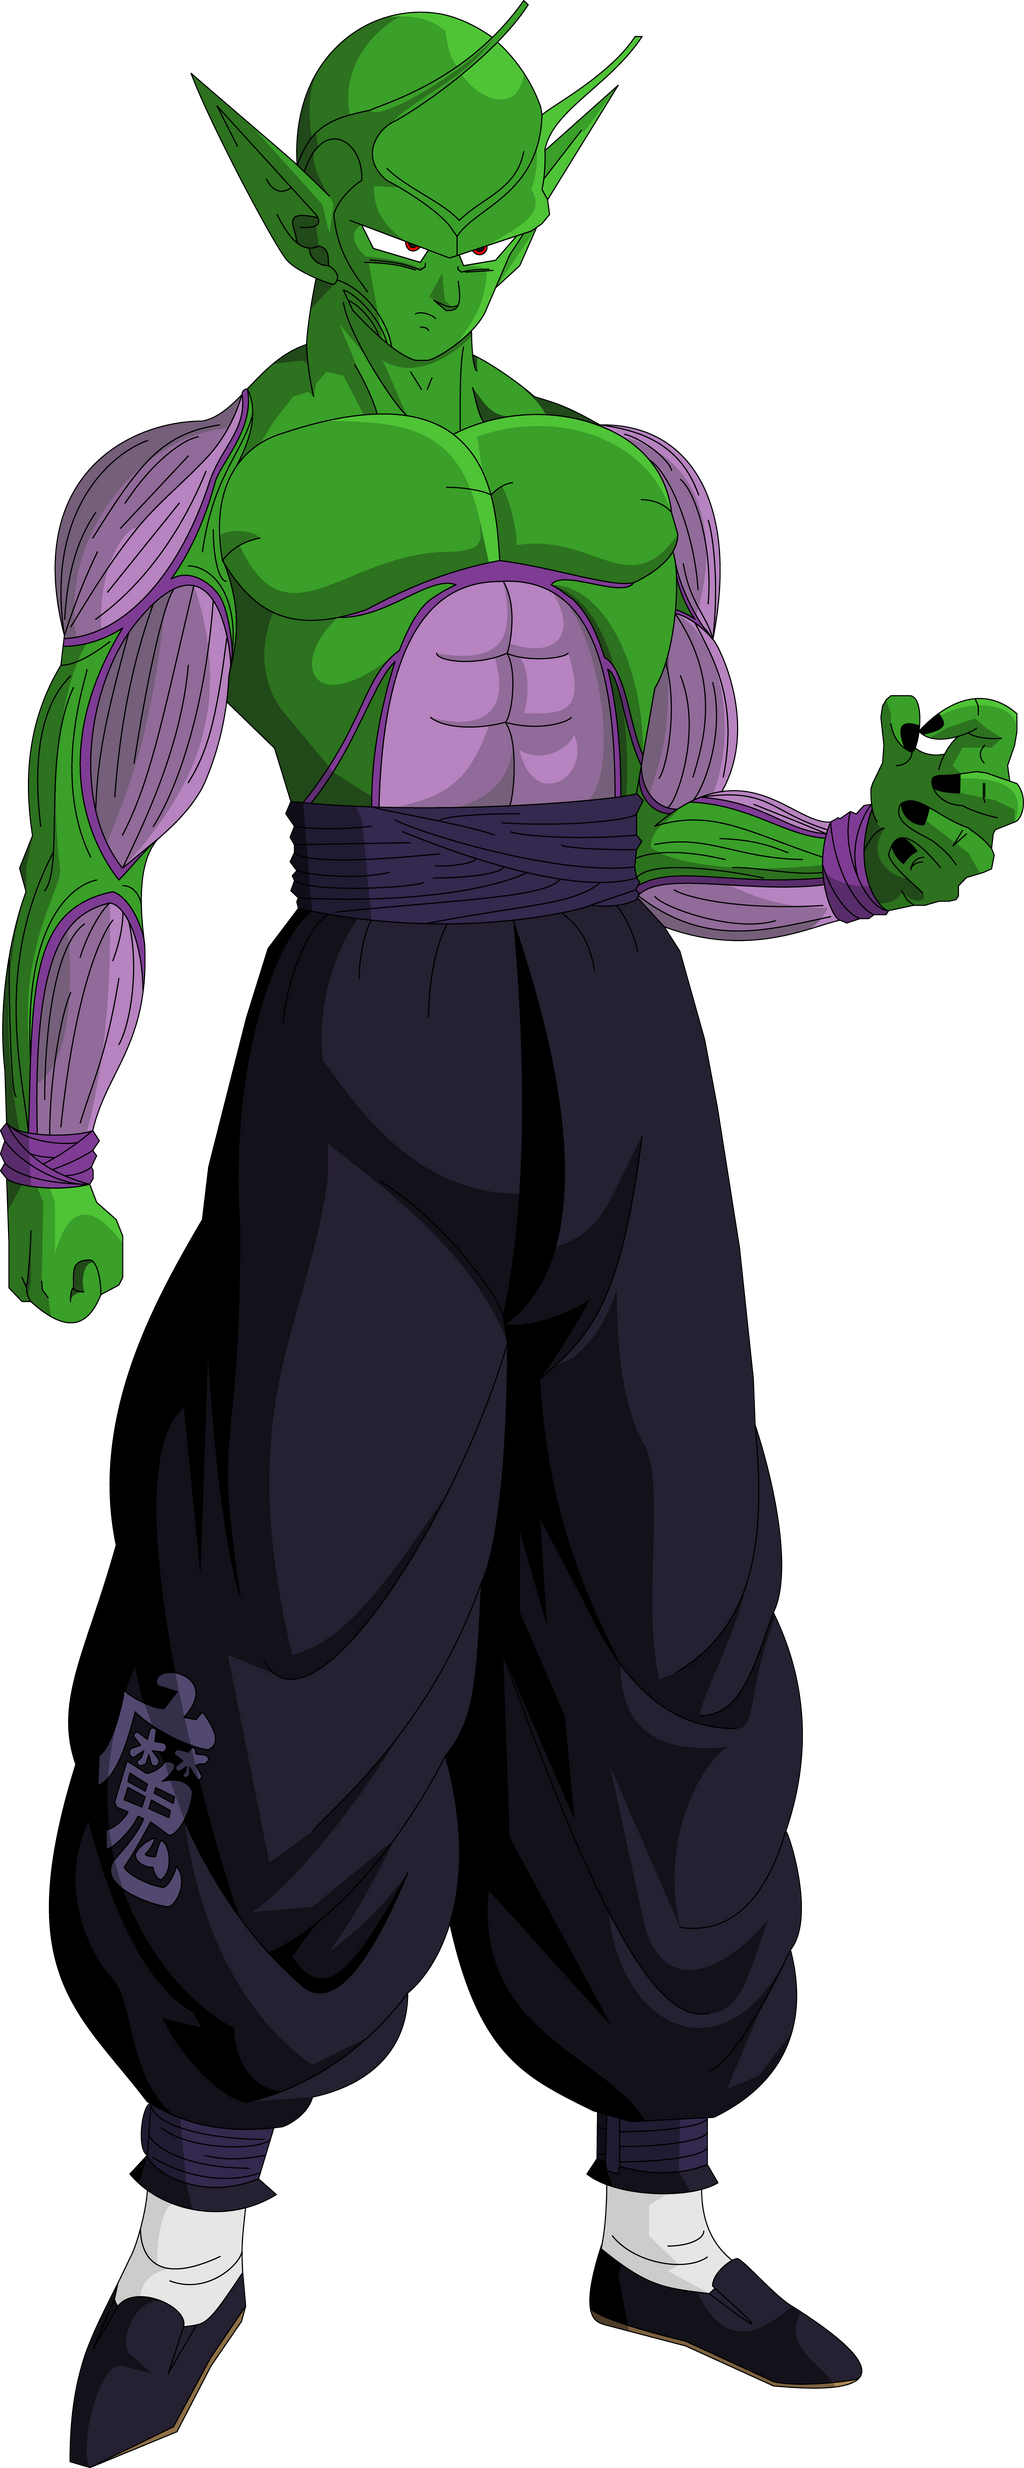 Piccolo (Saiyan Saga) MLL Redesign by OWC478